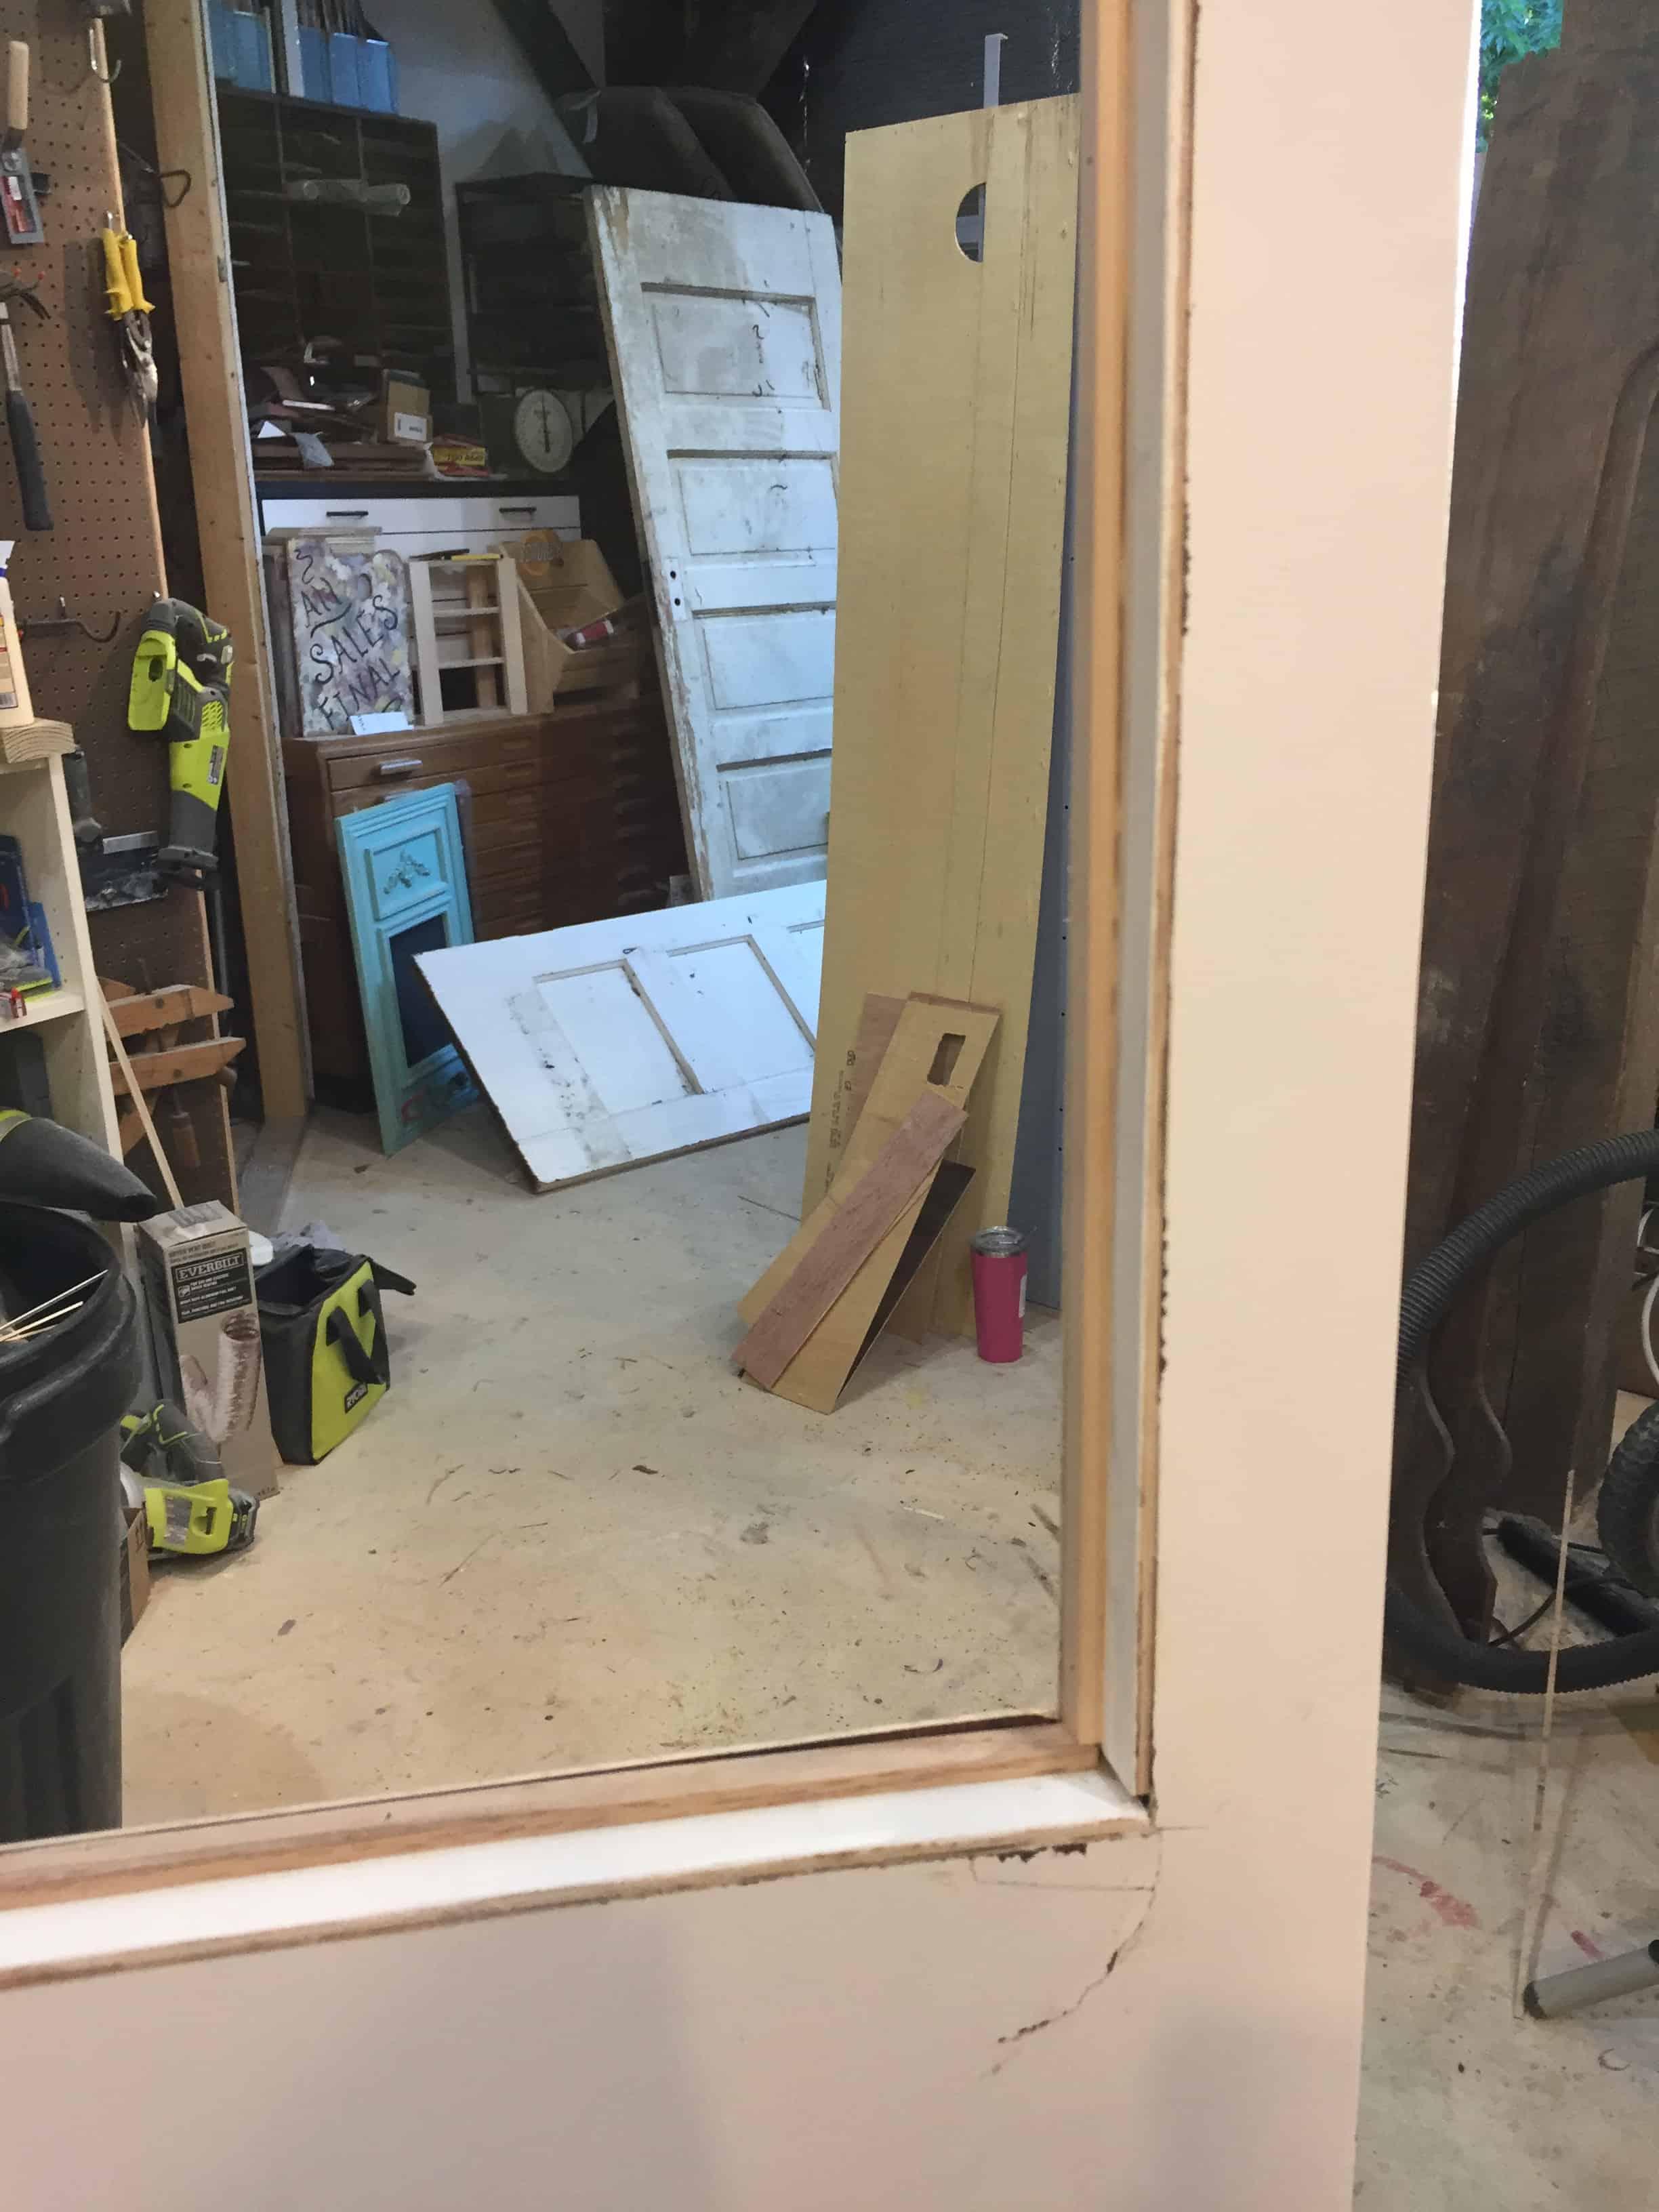 Saved by Scottie rv remodel office door trim out window close upJPG